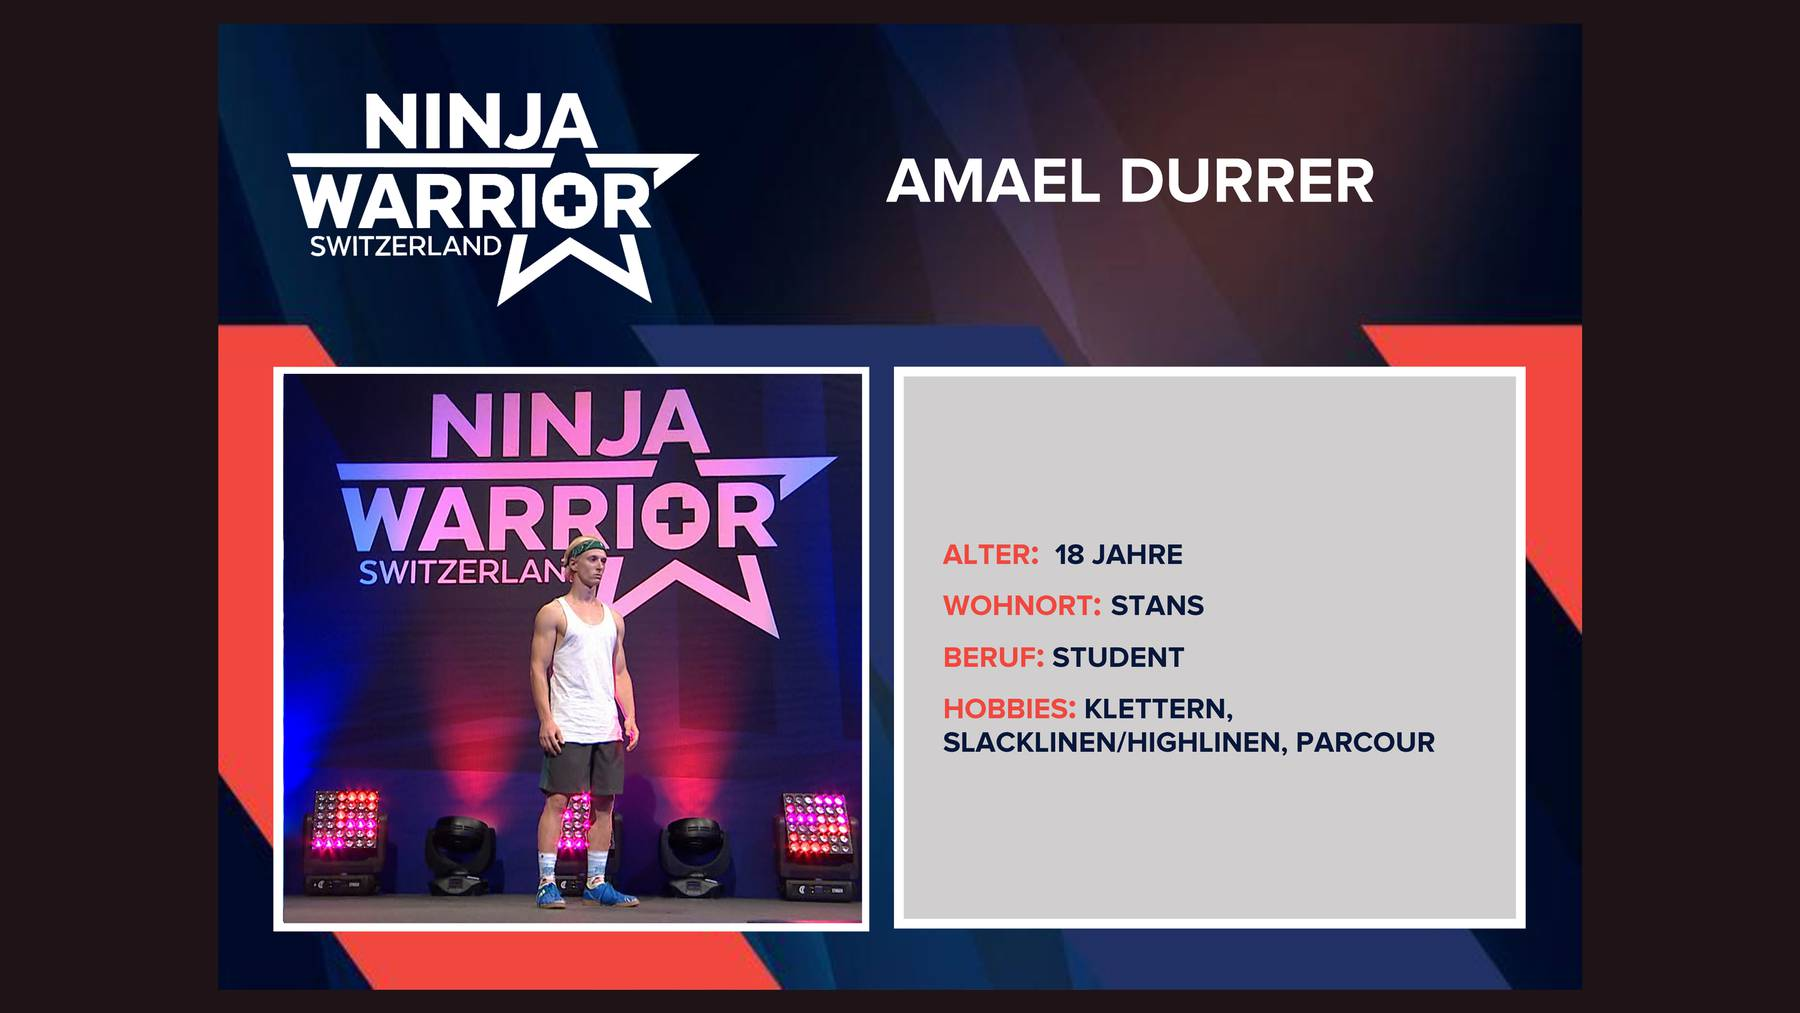 Amael Durrer